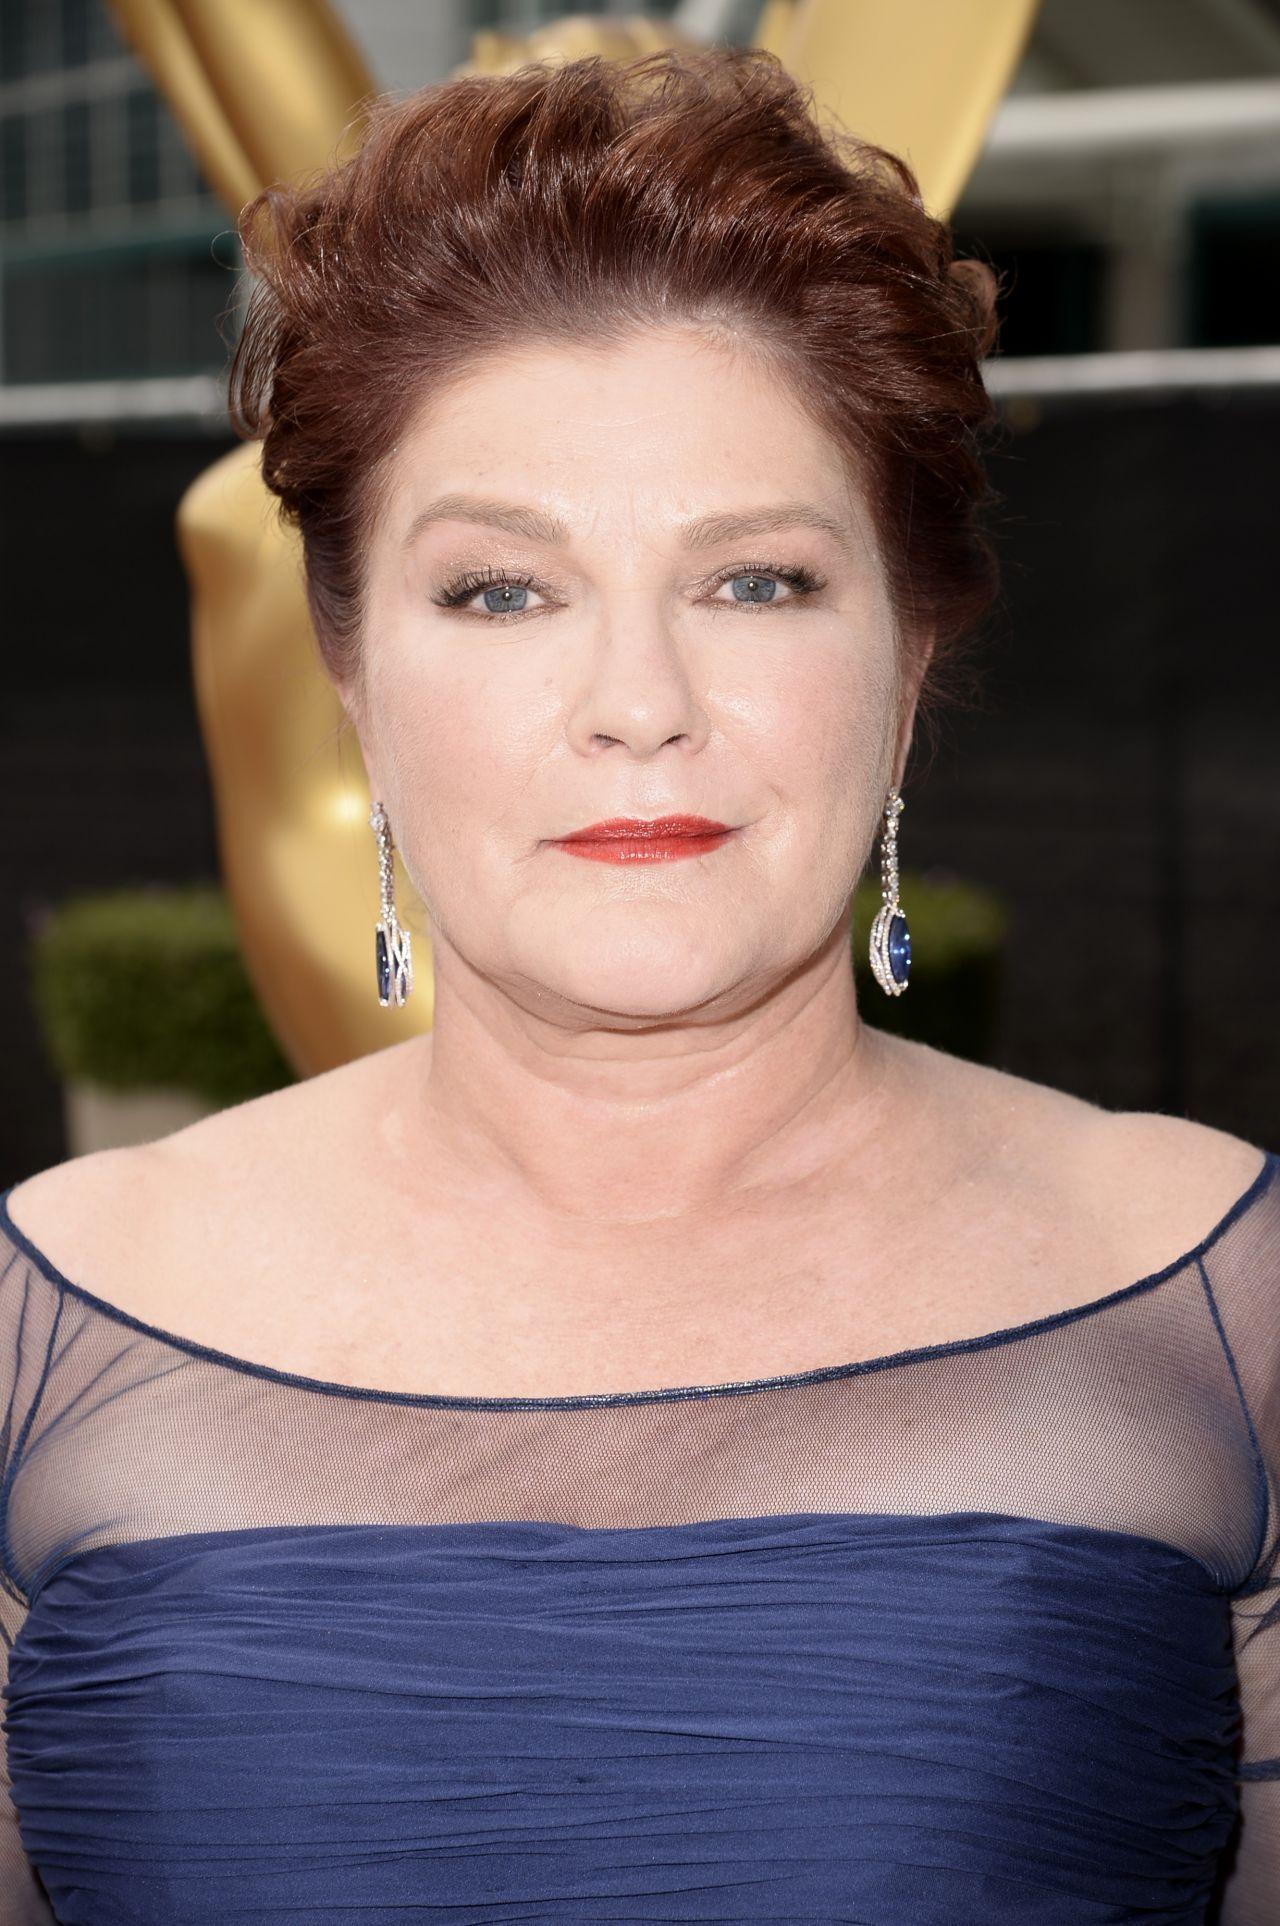 Kate Mulgrew - 66th Primetime Emmy Awards, Los Angeles - August 25, 2014